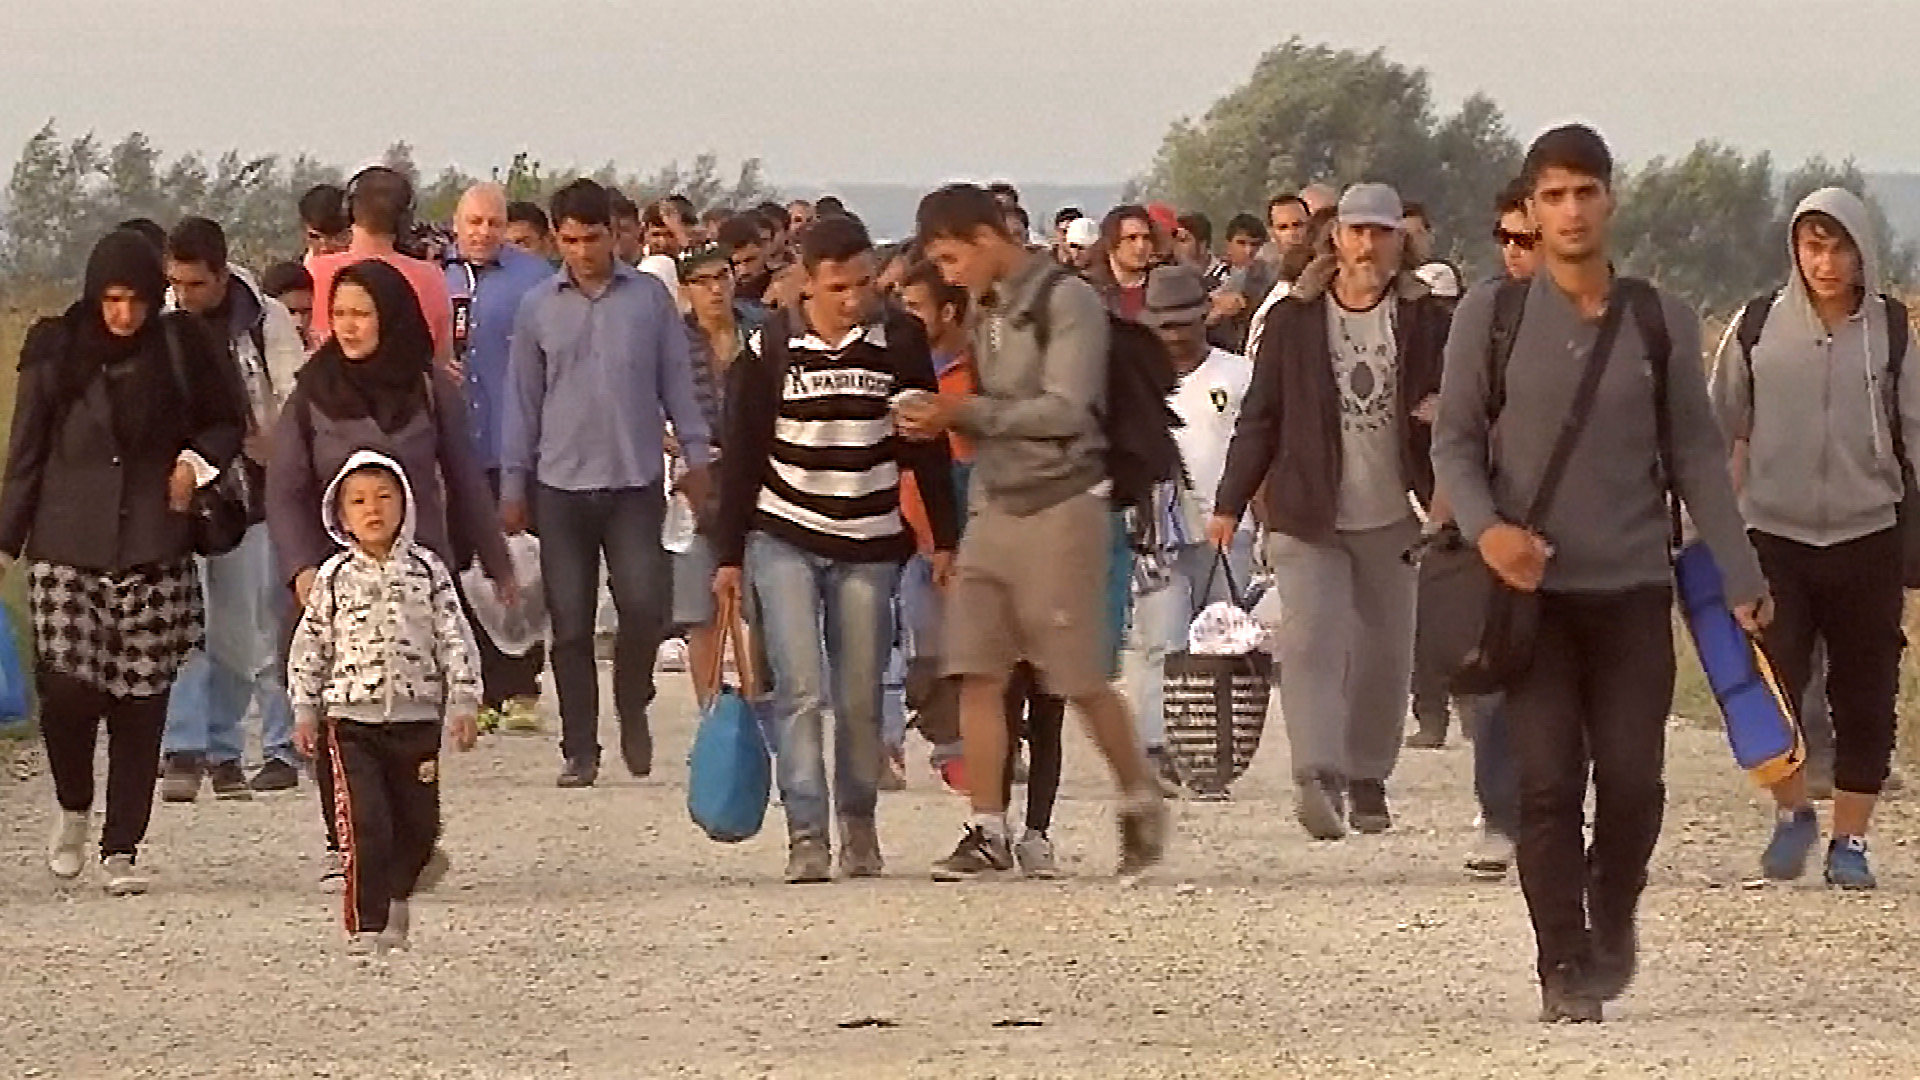 Migrants in Europe Face Minefield 'Danger' in Croatia